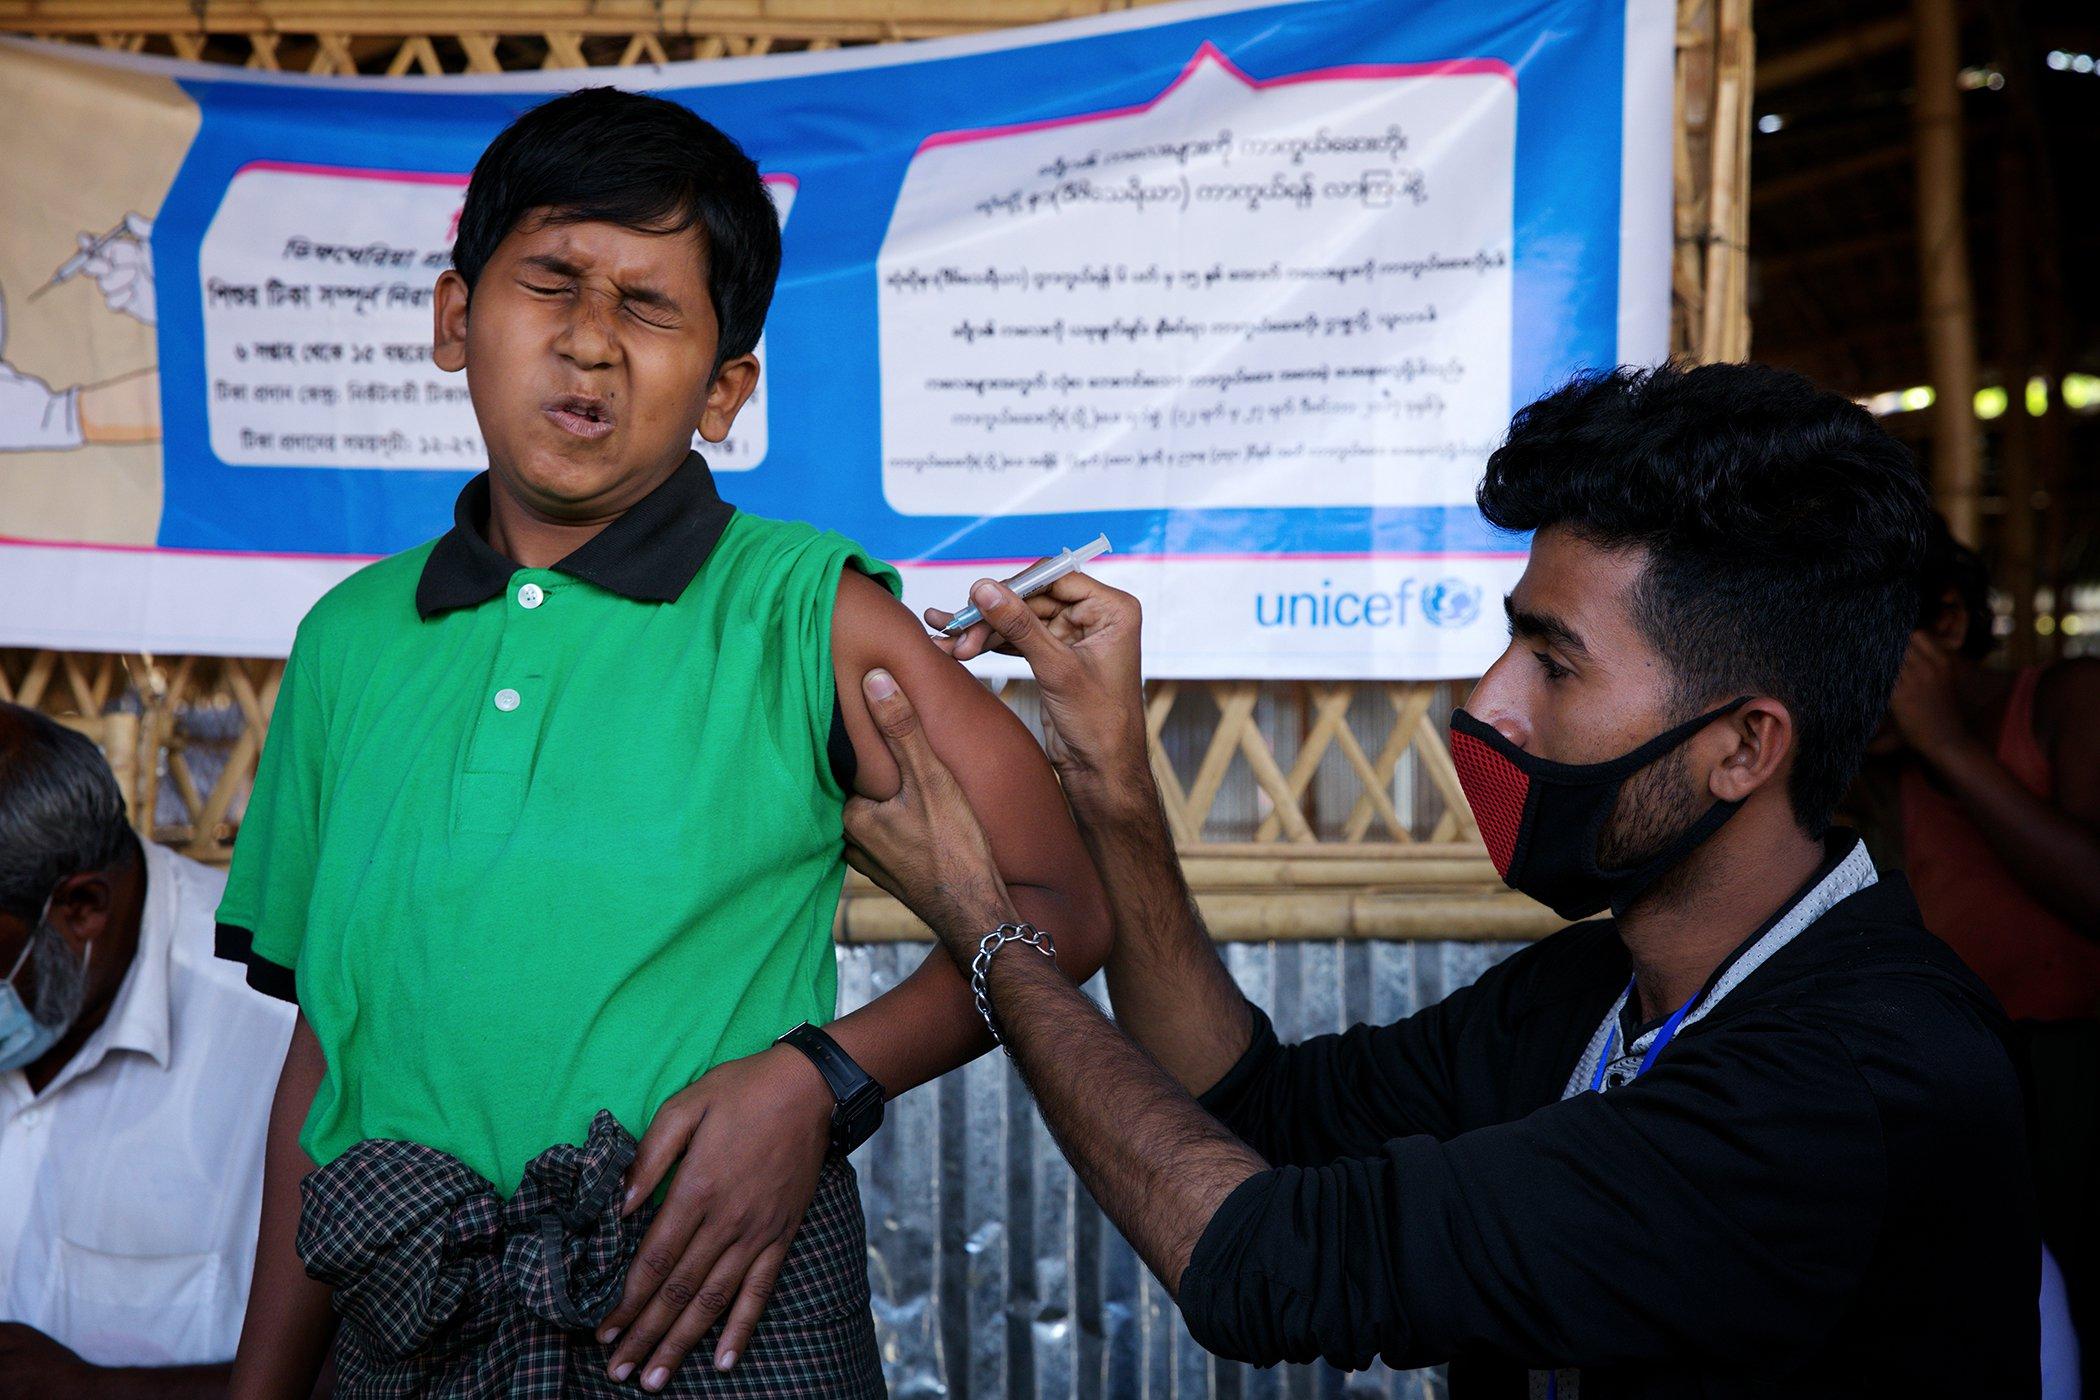 UNICEF_Vaccinations-Around-The-World_002.jpg